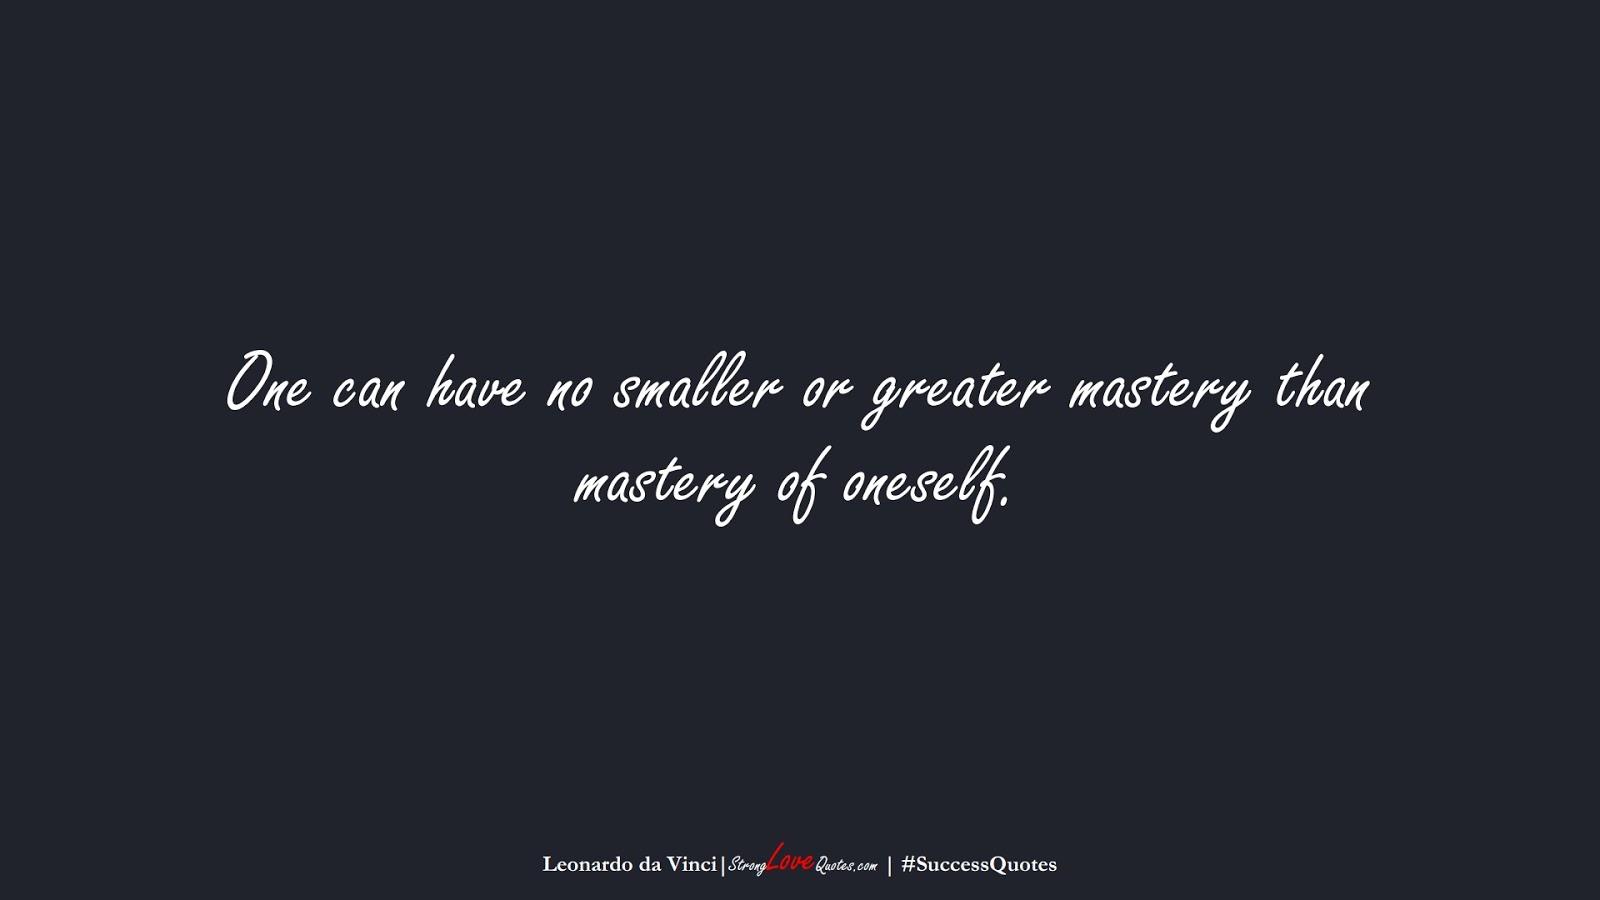 One can have no smaller or greater mastery than mastery of oneself. (Leonardo da Vinci);  #SuccessQuotes